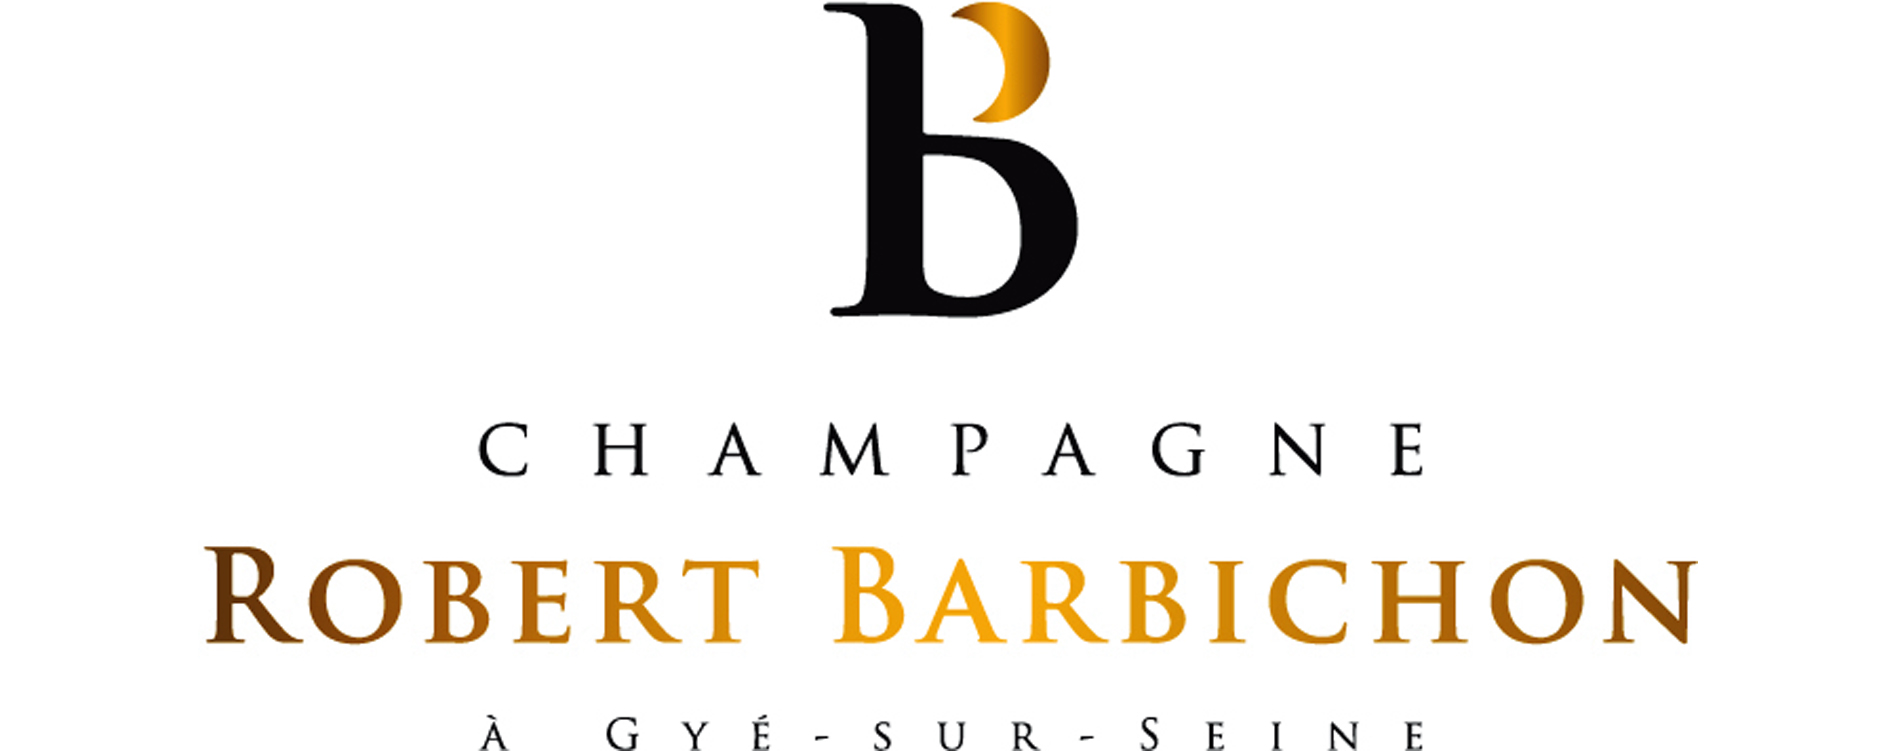 Champagne-Robert-Barbichon logo